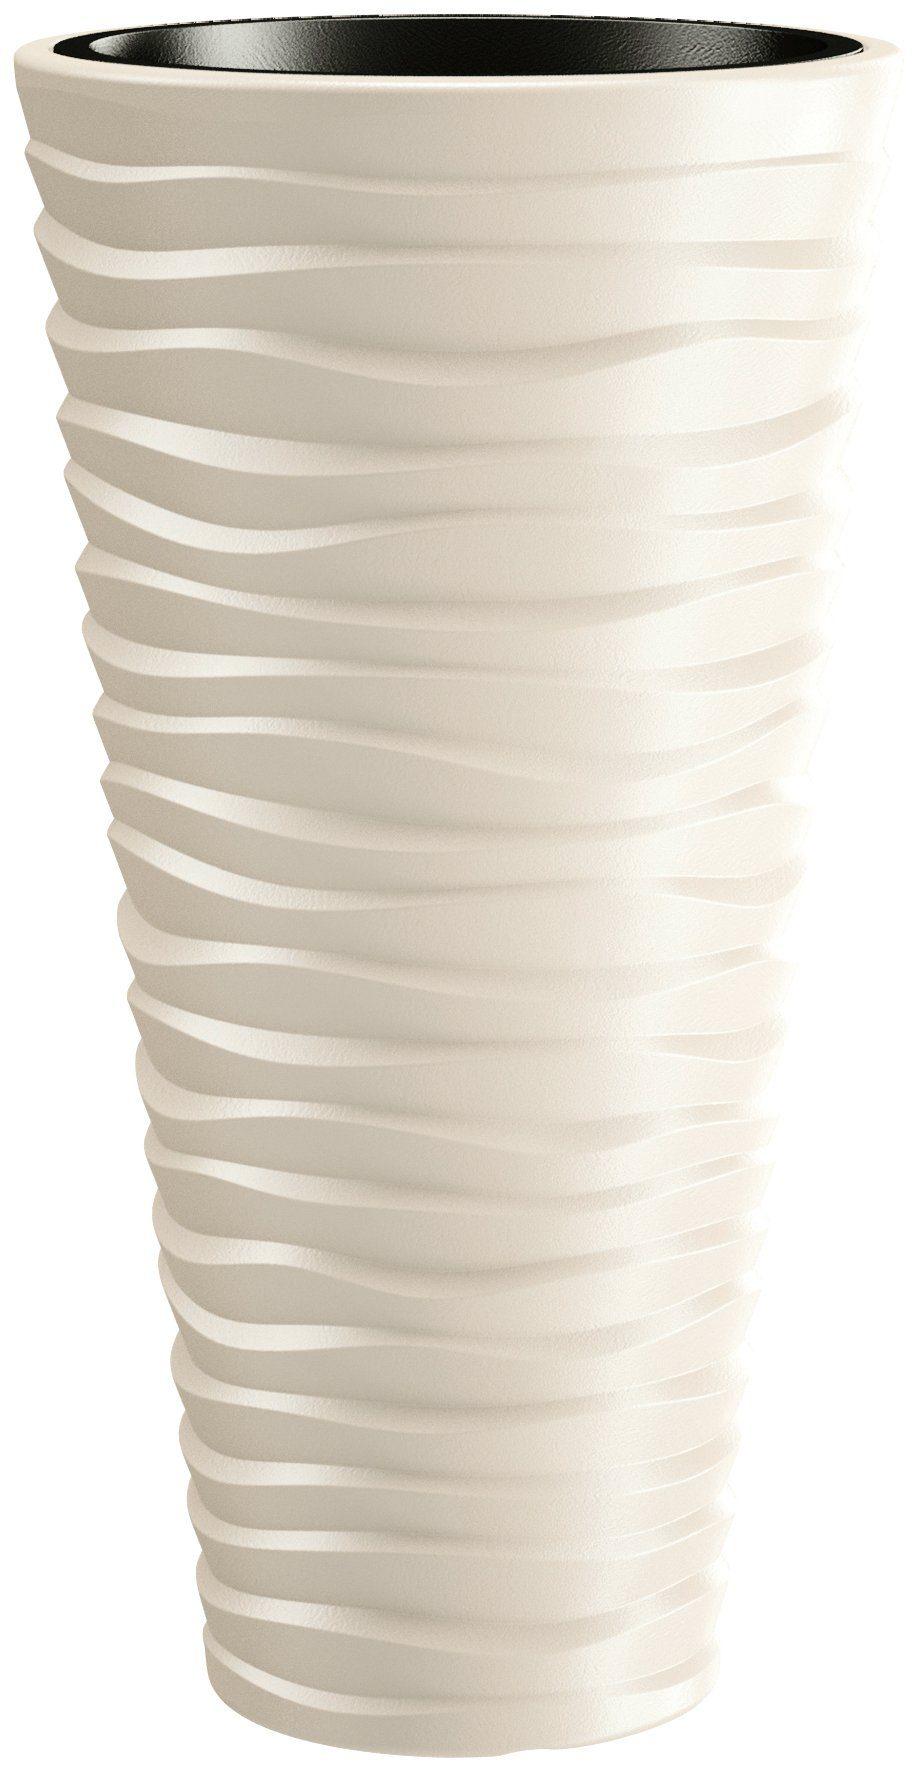 PROSPERPLAST Pflanzkübel »Sand slim«, ØxHöhe: 39x75 cm, creme